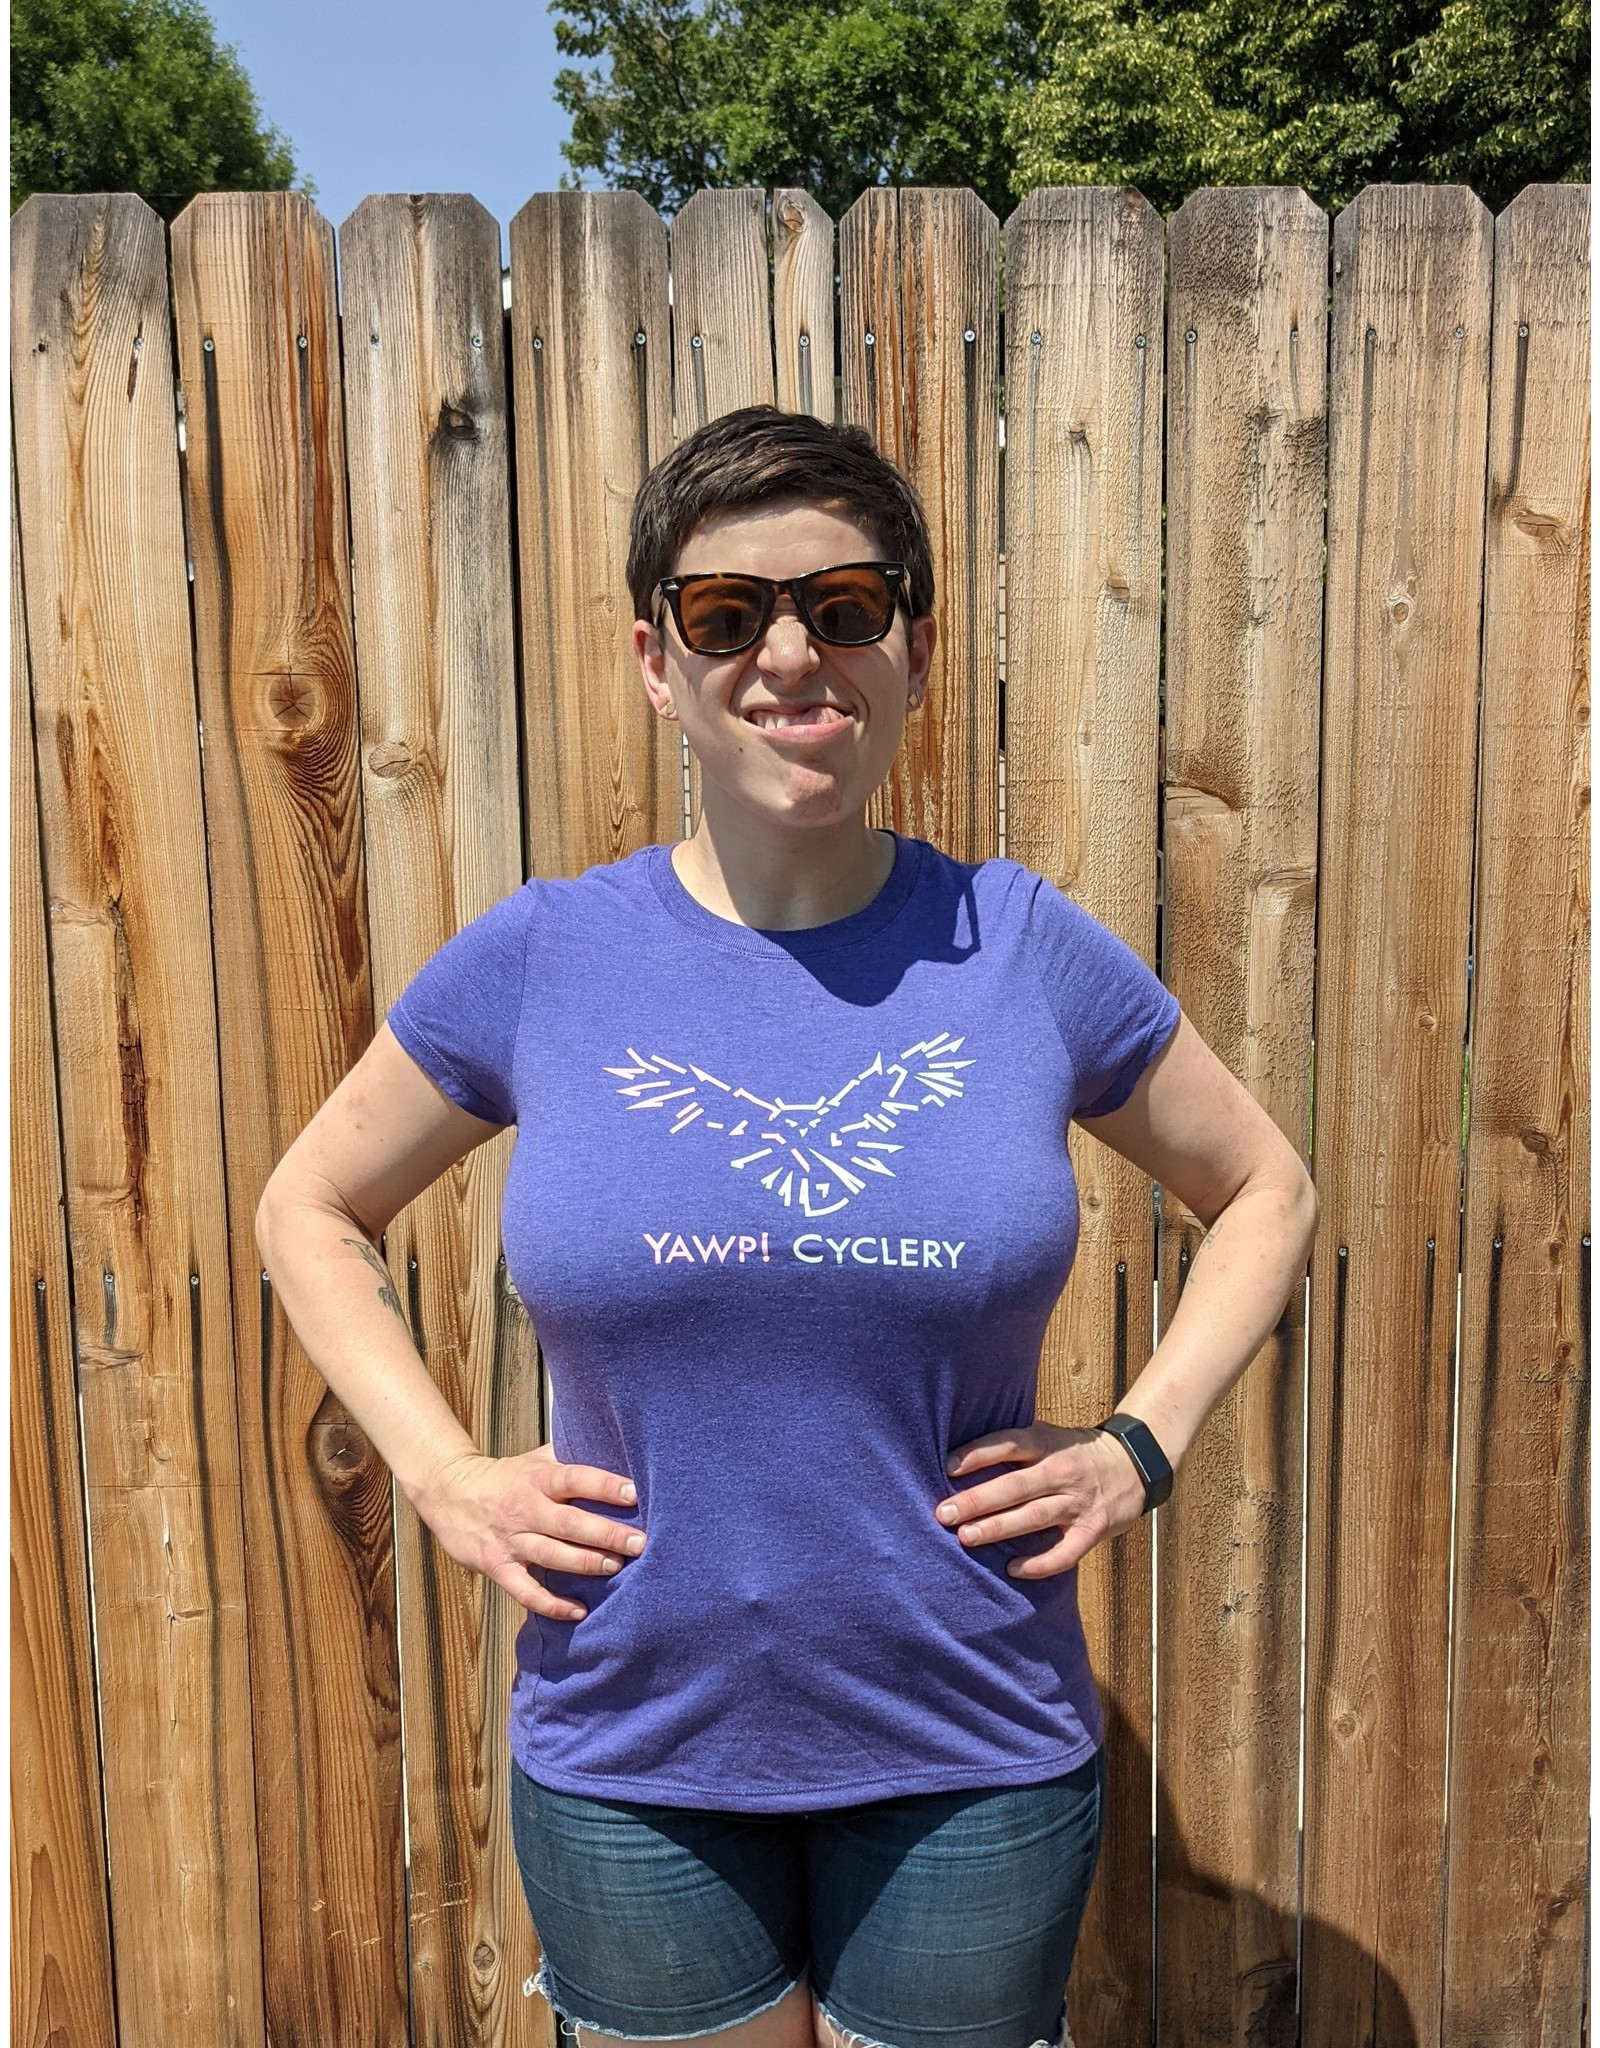 Yawp! Cyclery T-Shirt Tri-Blend - Women's